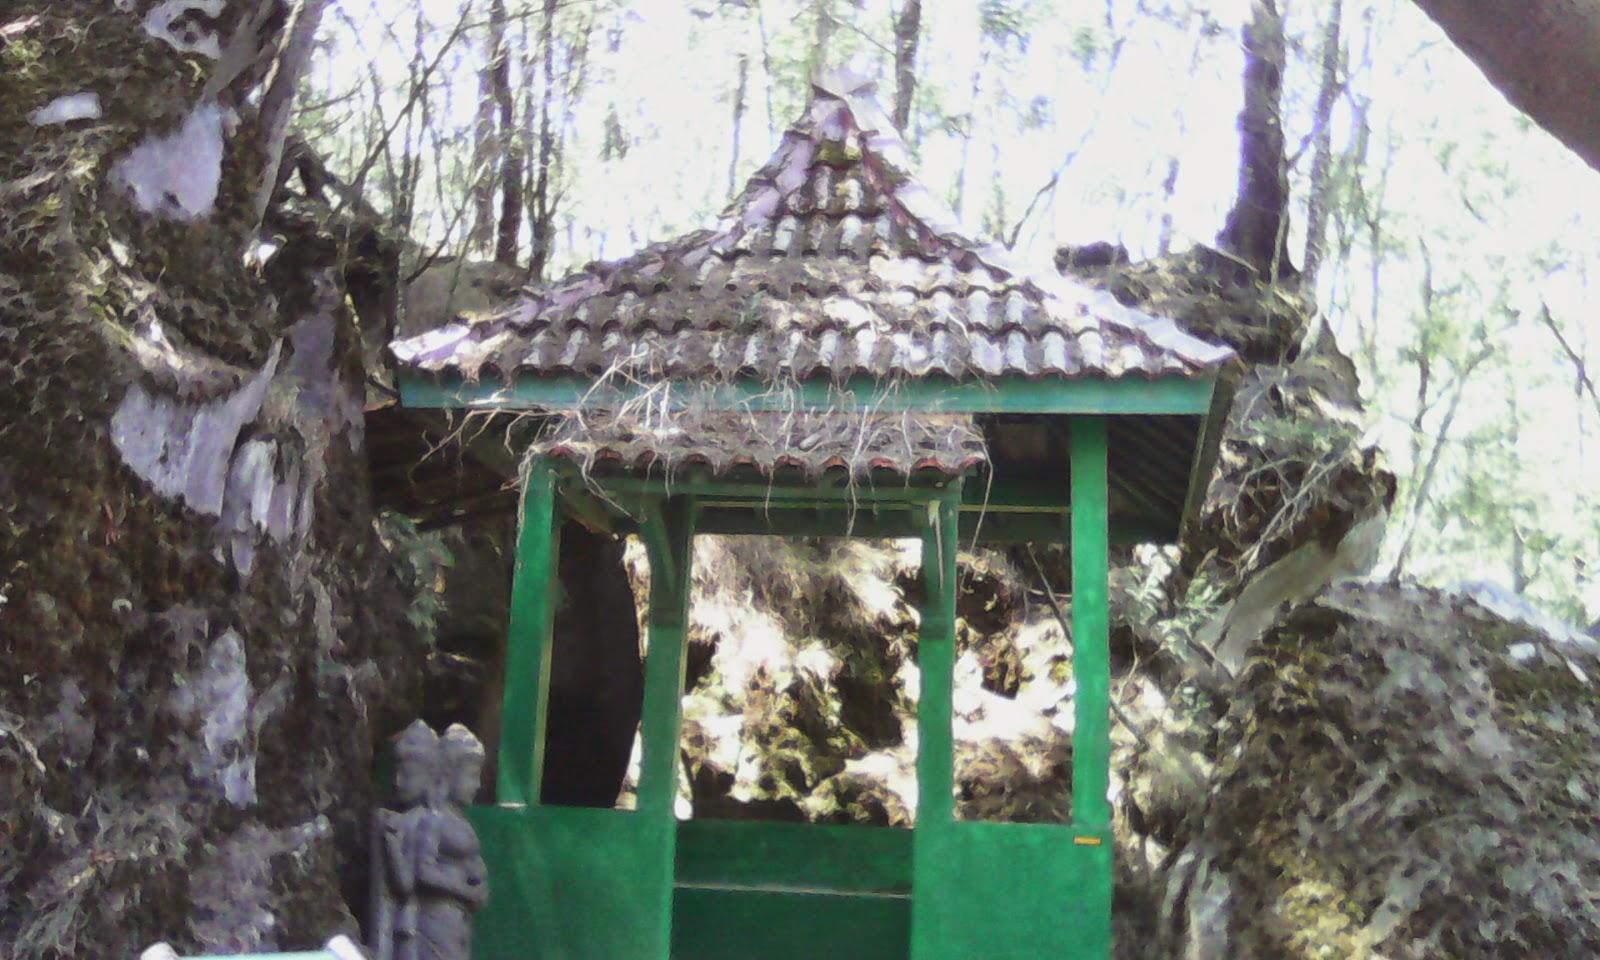 obyek wisata yang wajib di kunjungi, antara lain Goa Semar, Goa Sumur, Goa Jaran, Serta Batu tulis. Di Goa-goa tadi menurut masyarakat sekitar sering di jadikan buat ritual tertentu. Bahkan konon katanya Almarhum Presiden Soeharto sebelum menjadi Presiden juga sering melakukan tirakat di Goa Semar.